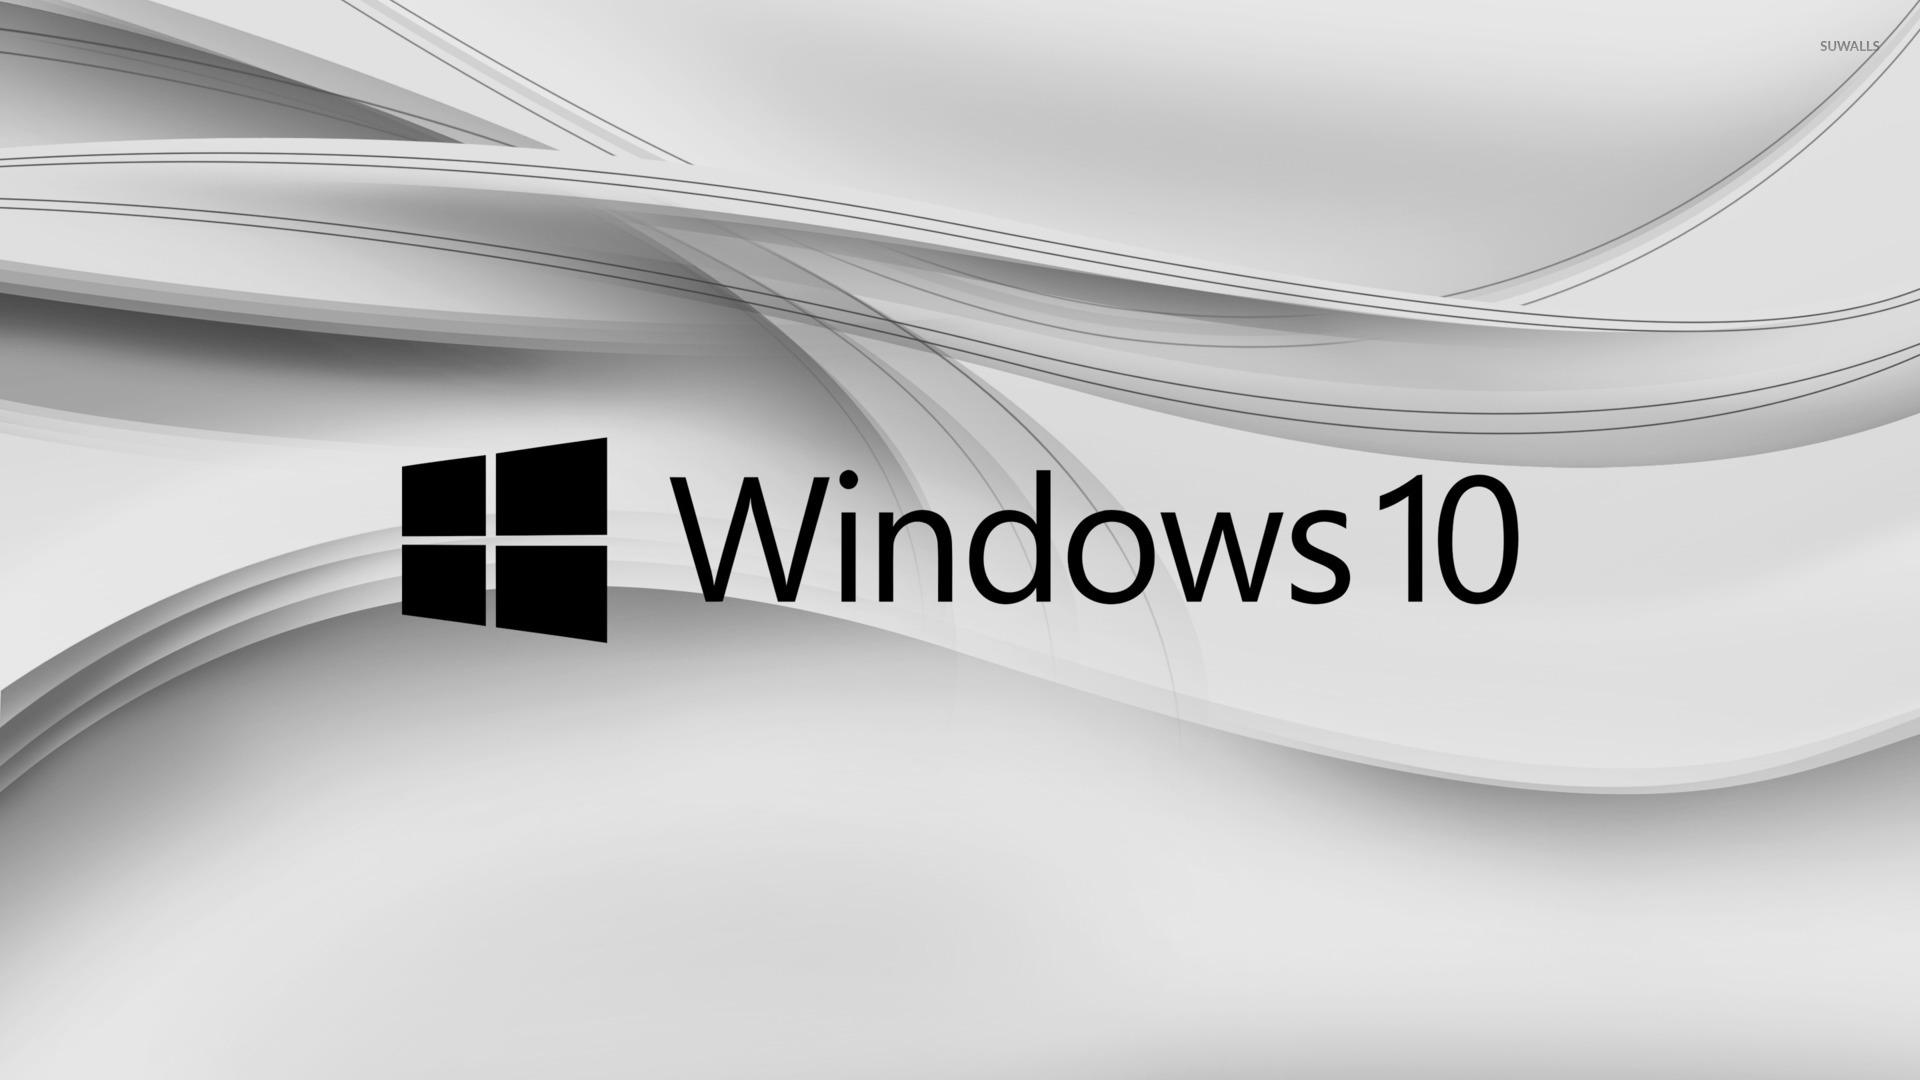 Windows 10 Black Text Logo On Gray Aves Wallpaper